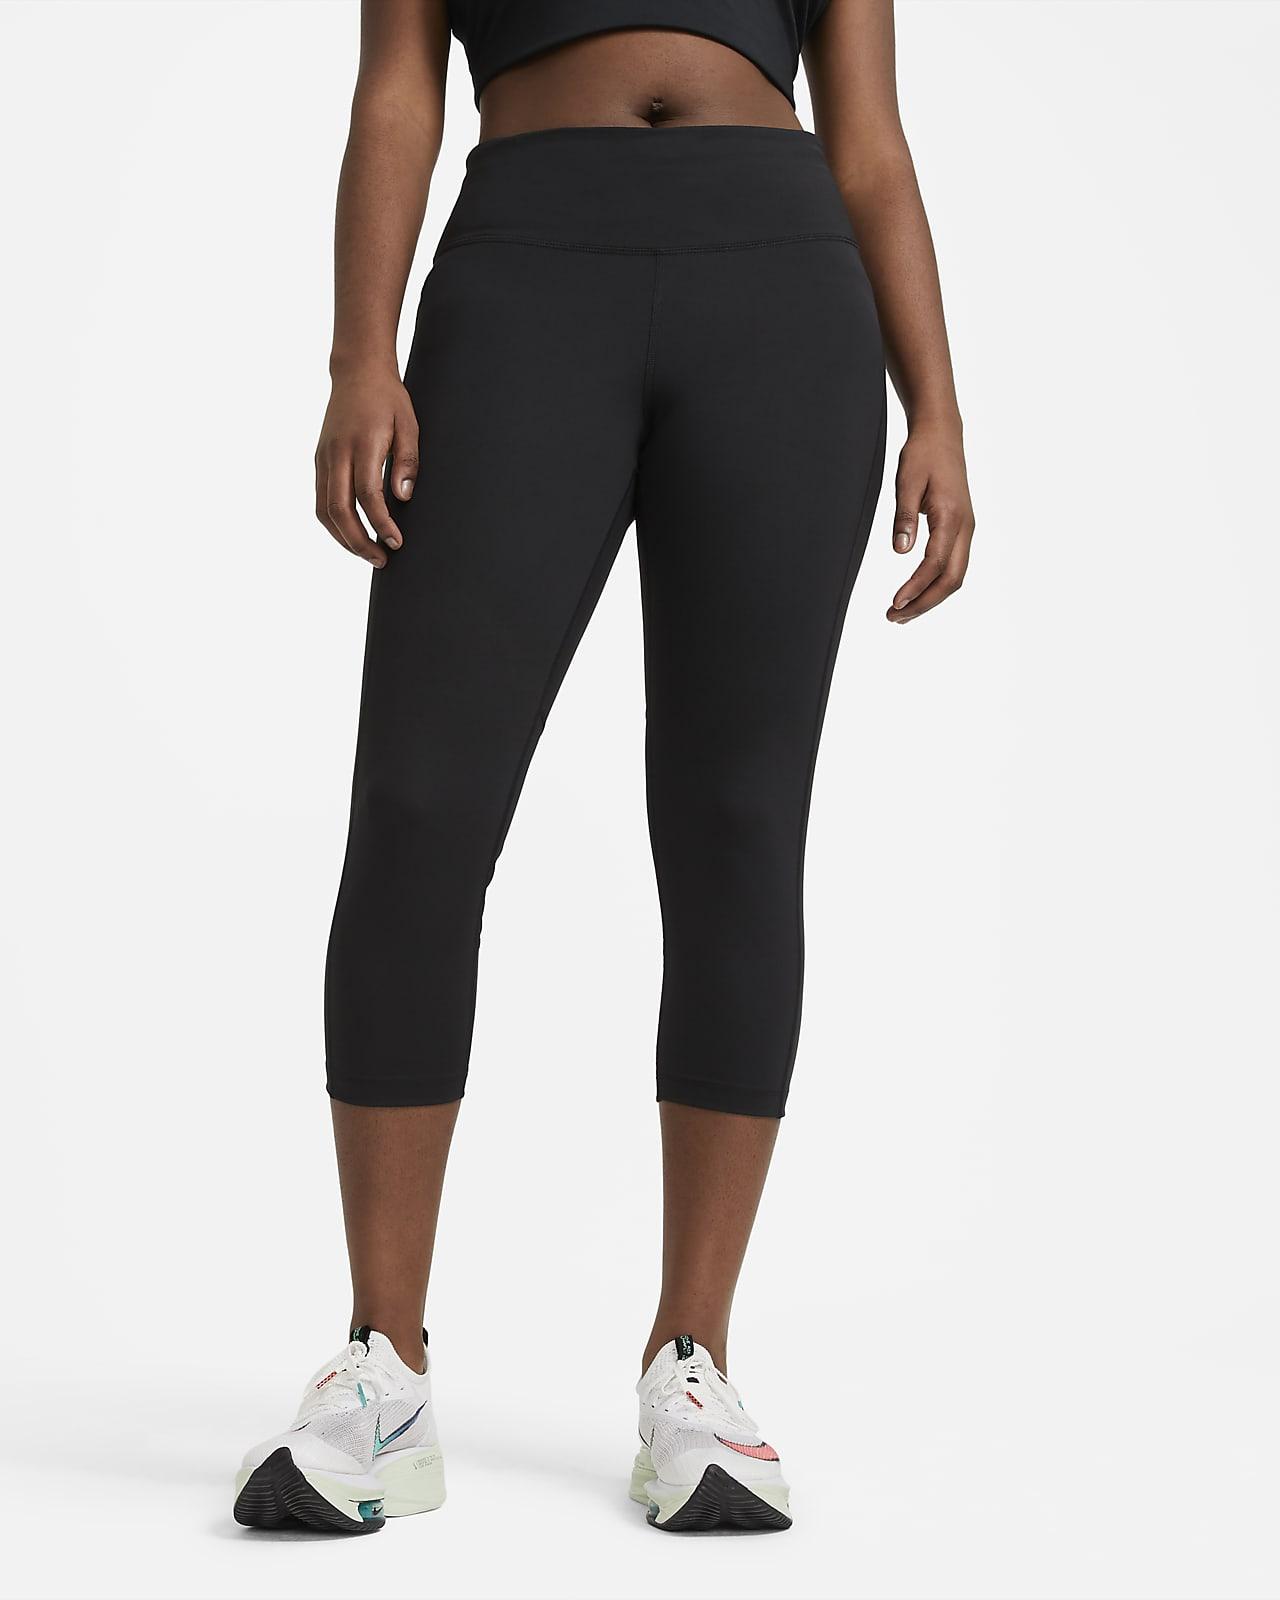 Legging de running court à taille mi-basse Nike Fast pour Femme (grande taille)